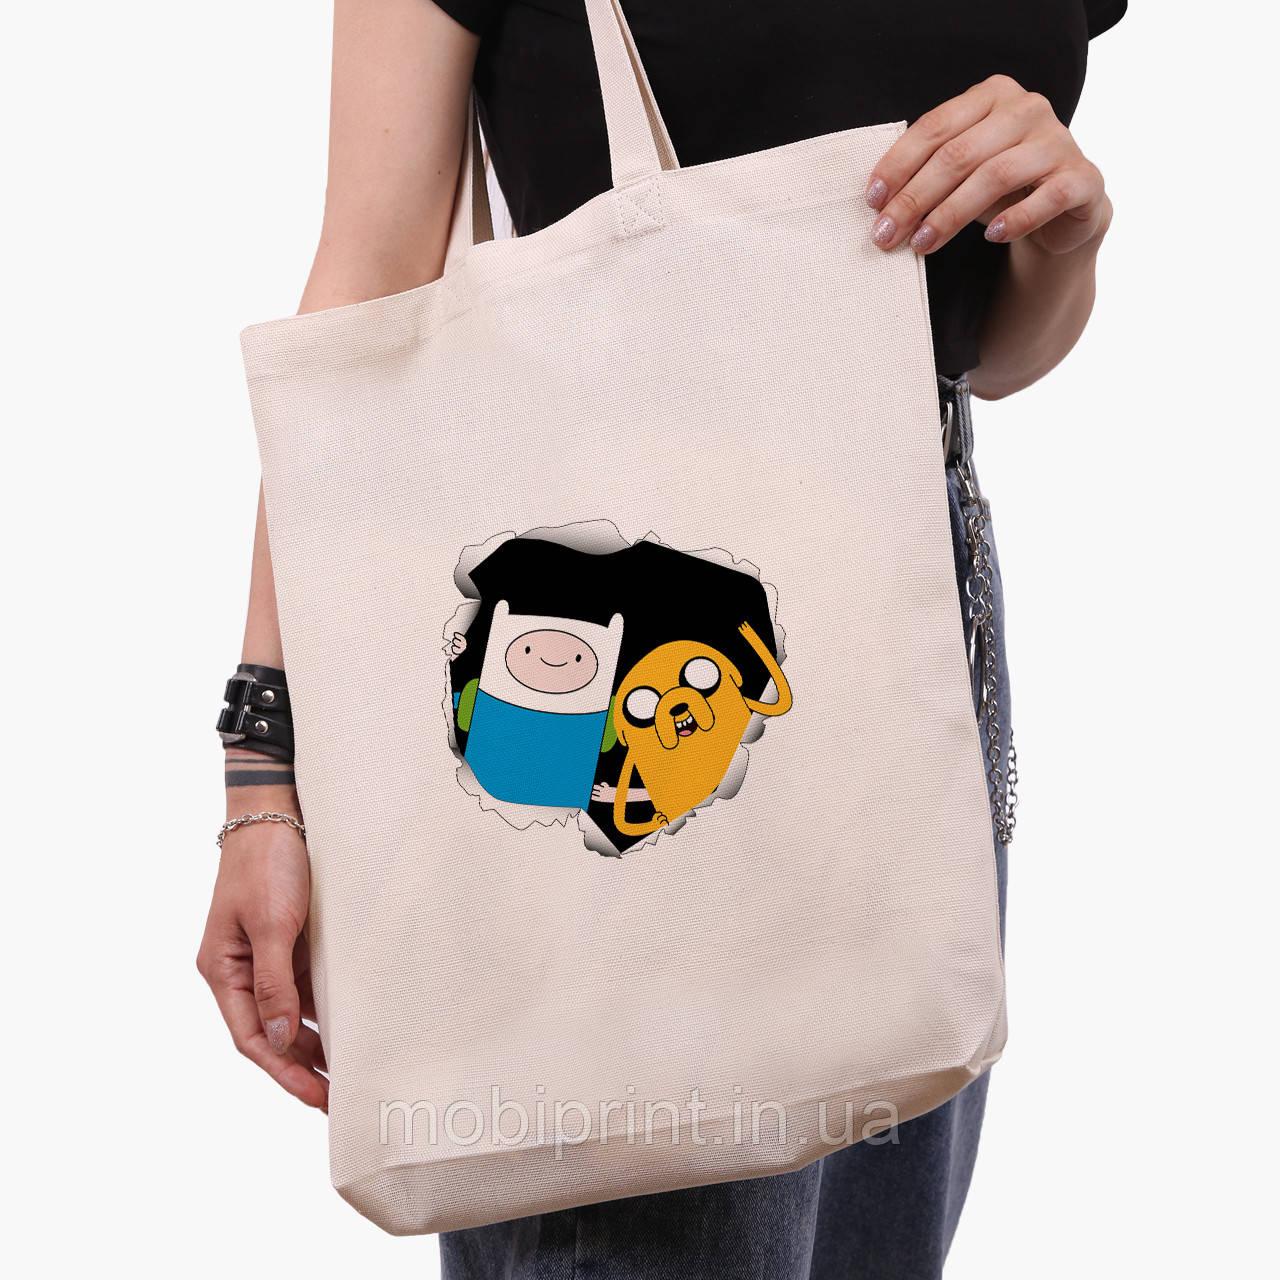 Эко сумка шоппер белая Финн и Джейк пес (Adventure Time) (9227-1581-1)  экосумка шопер 41*39*8 см